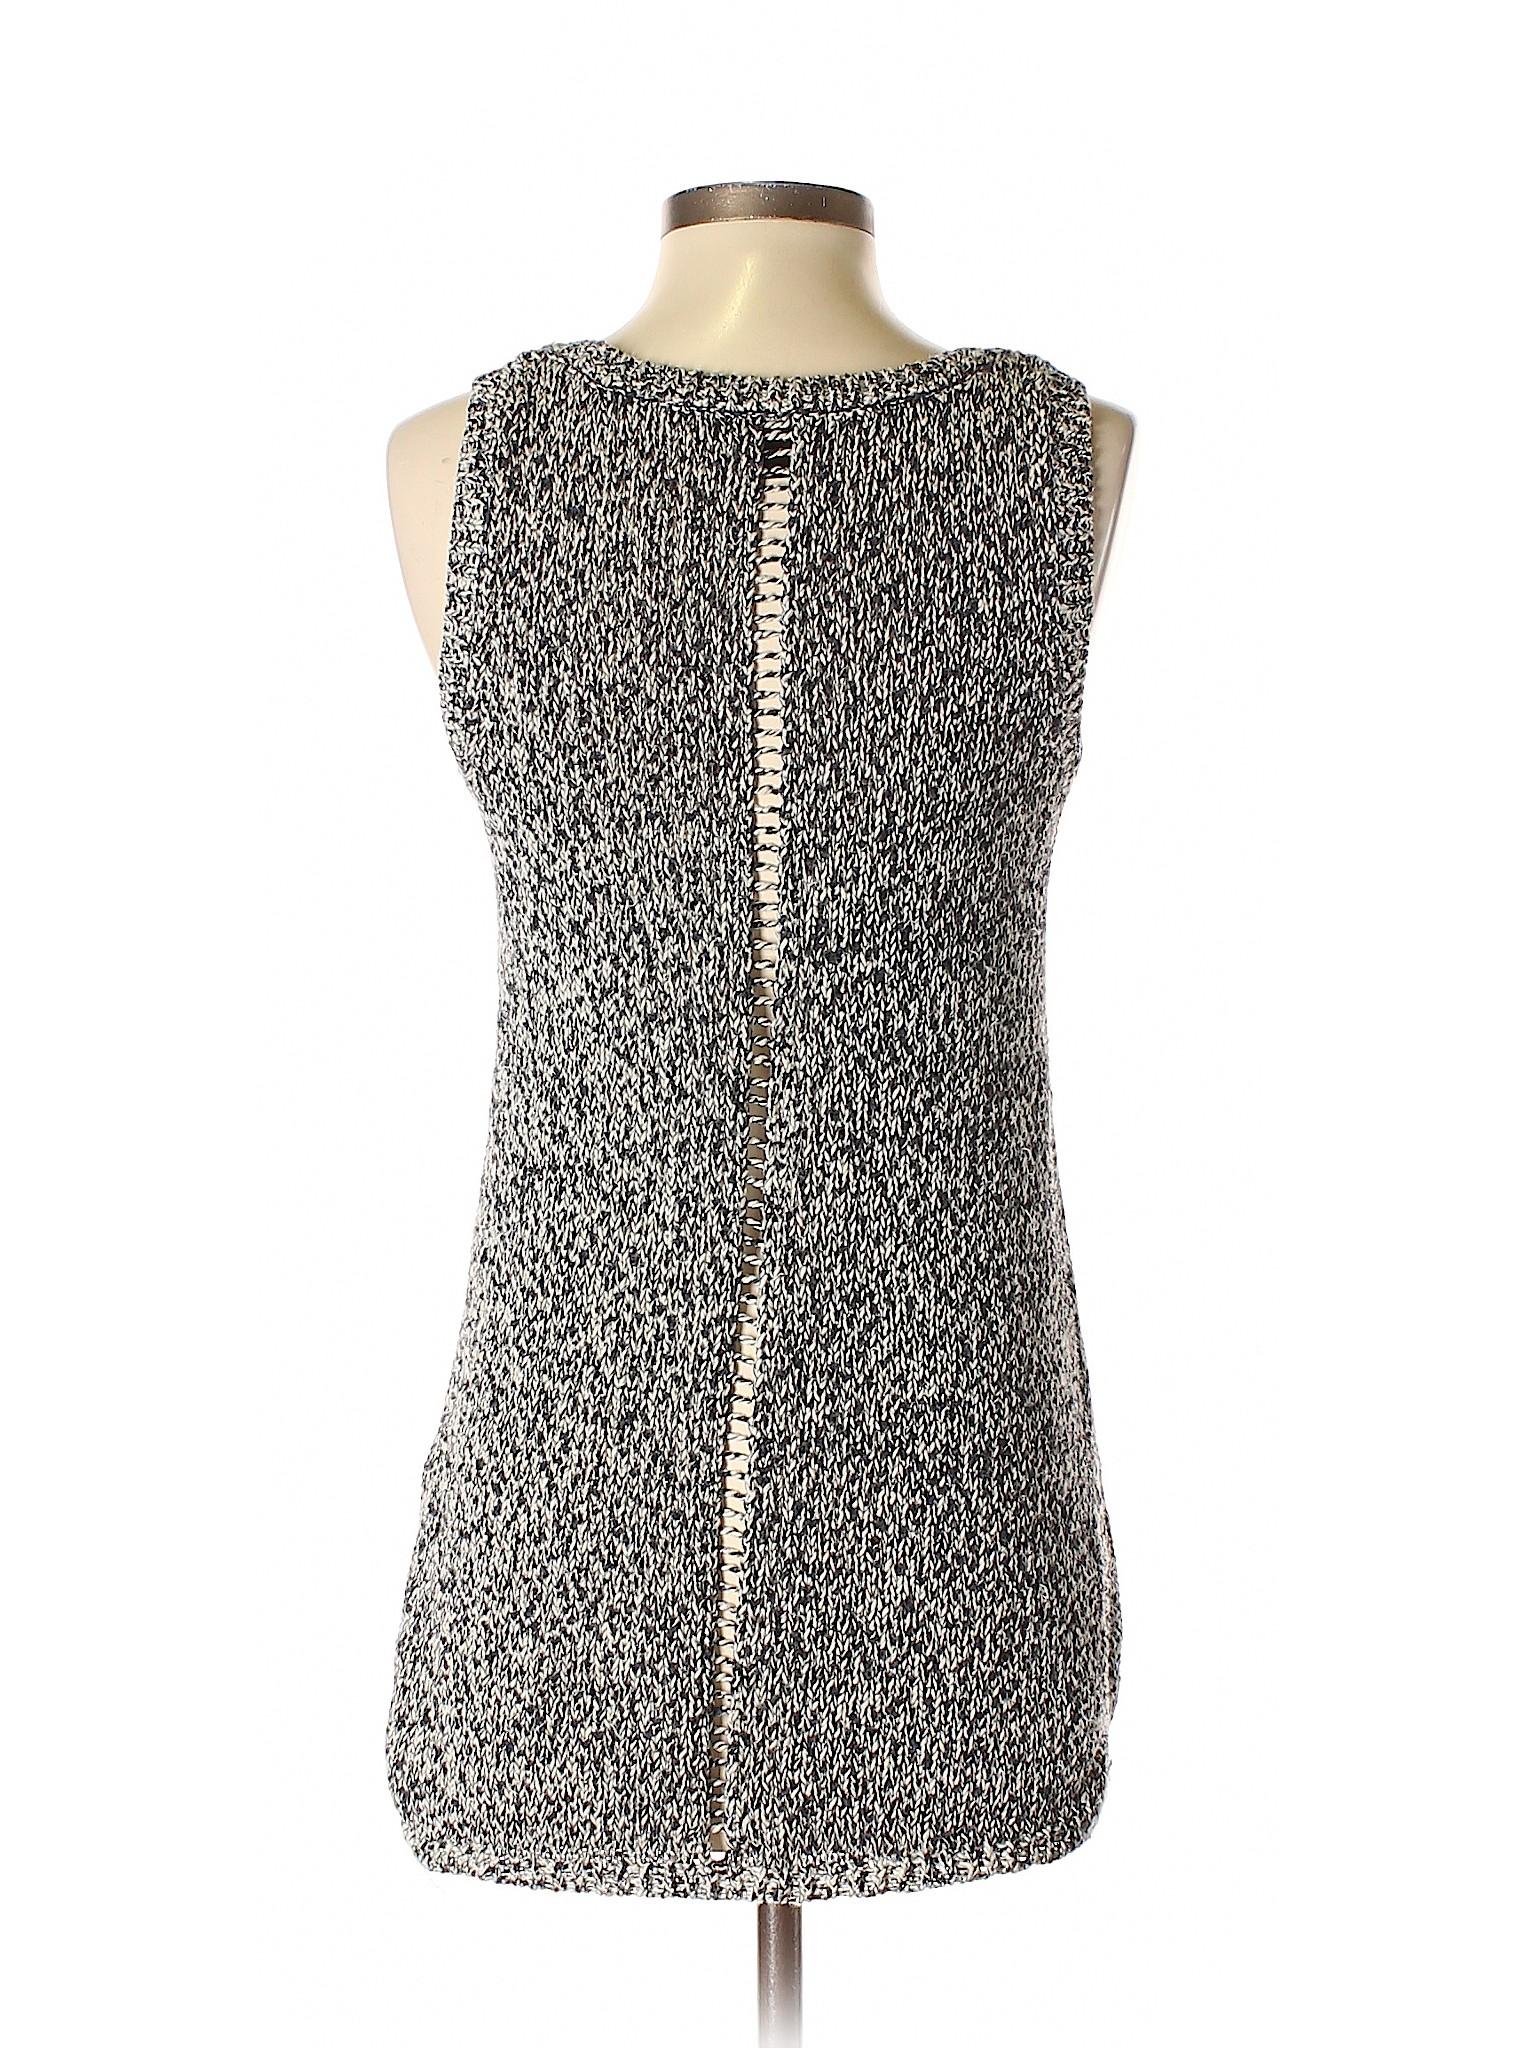 Pullover winter Boutique Topshop winter Sweater Boutique Topshop w1ggrdXxBq